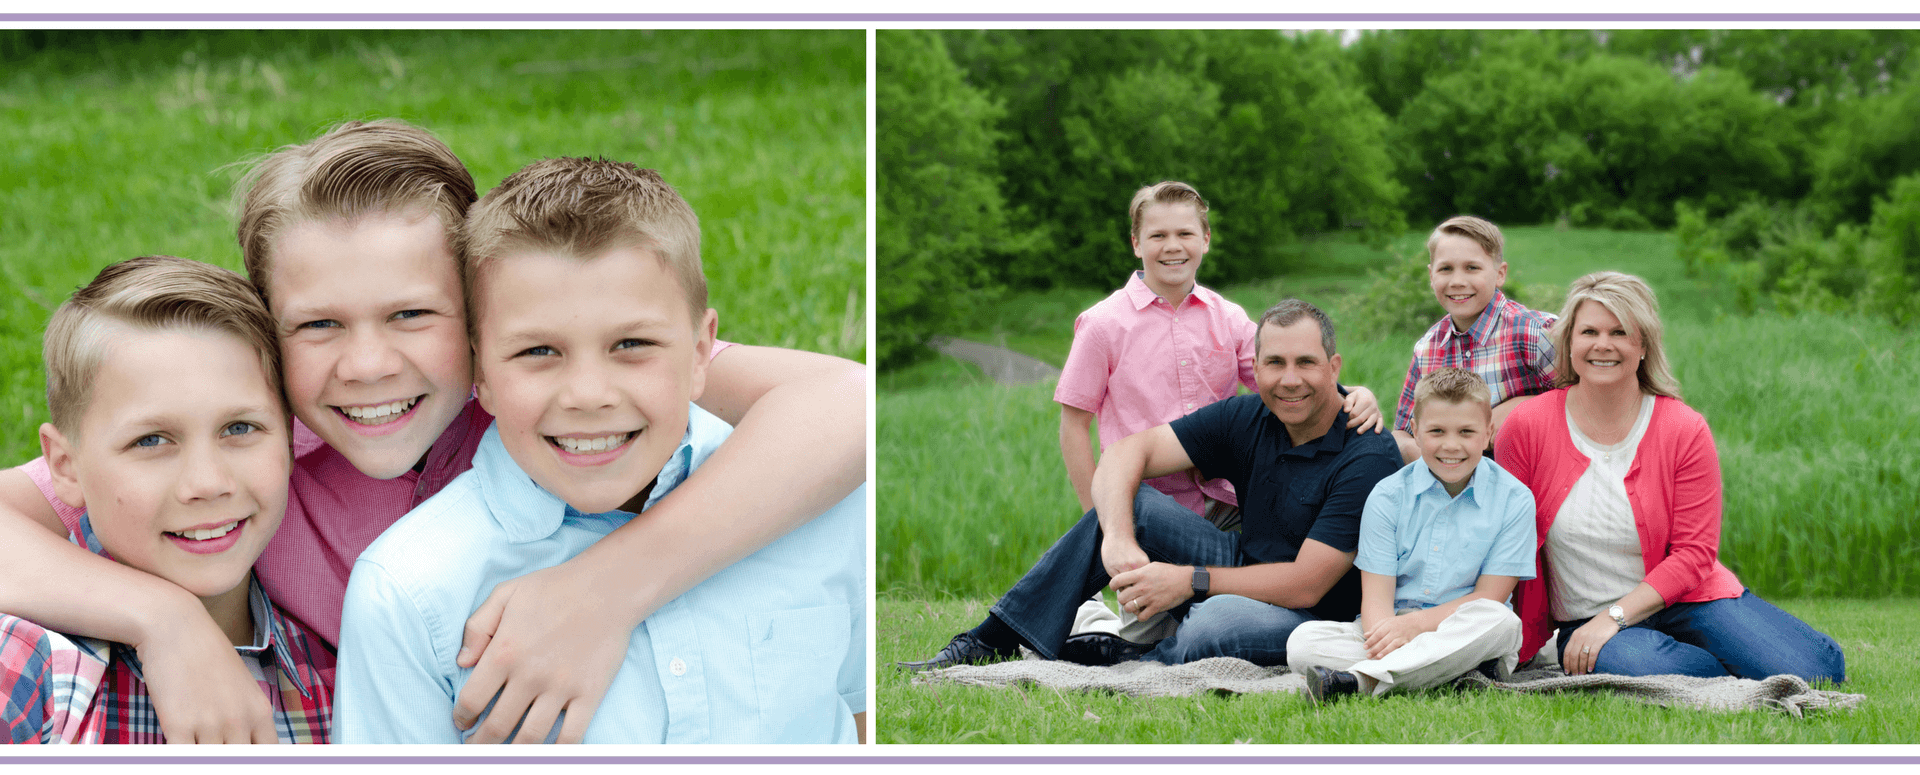 Woodbury MN Photographer | Professional Family Photographer | Focus Photography by Susan